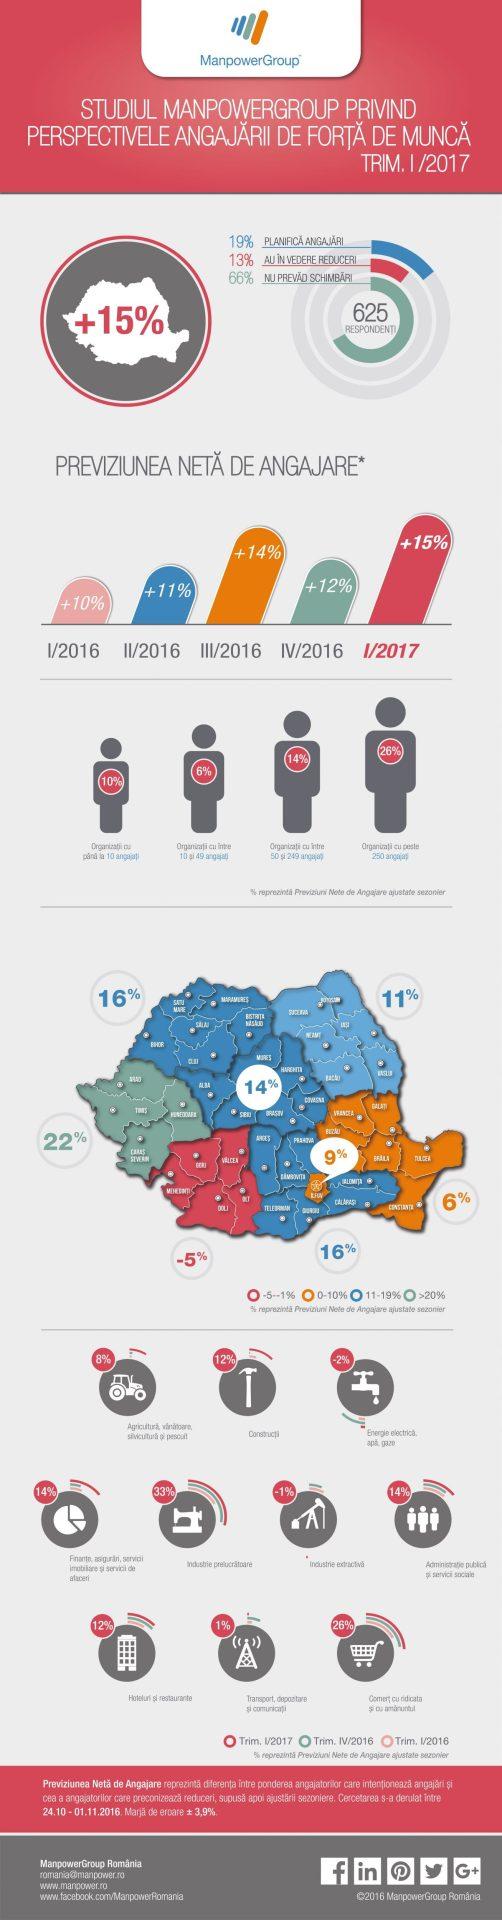 meos-q117-infographic_ro-compressed